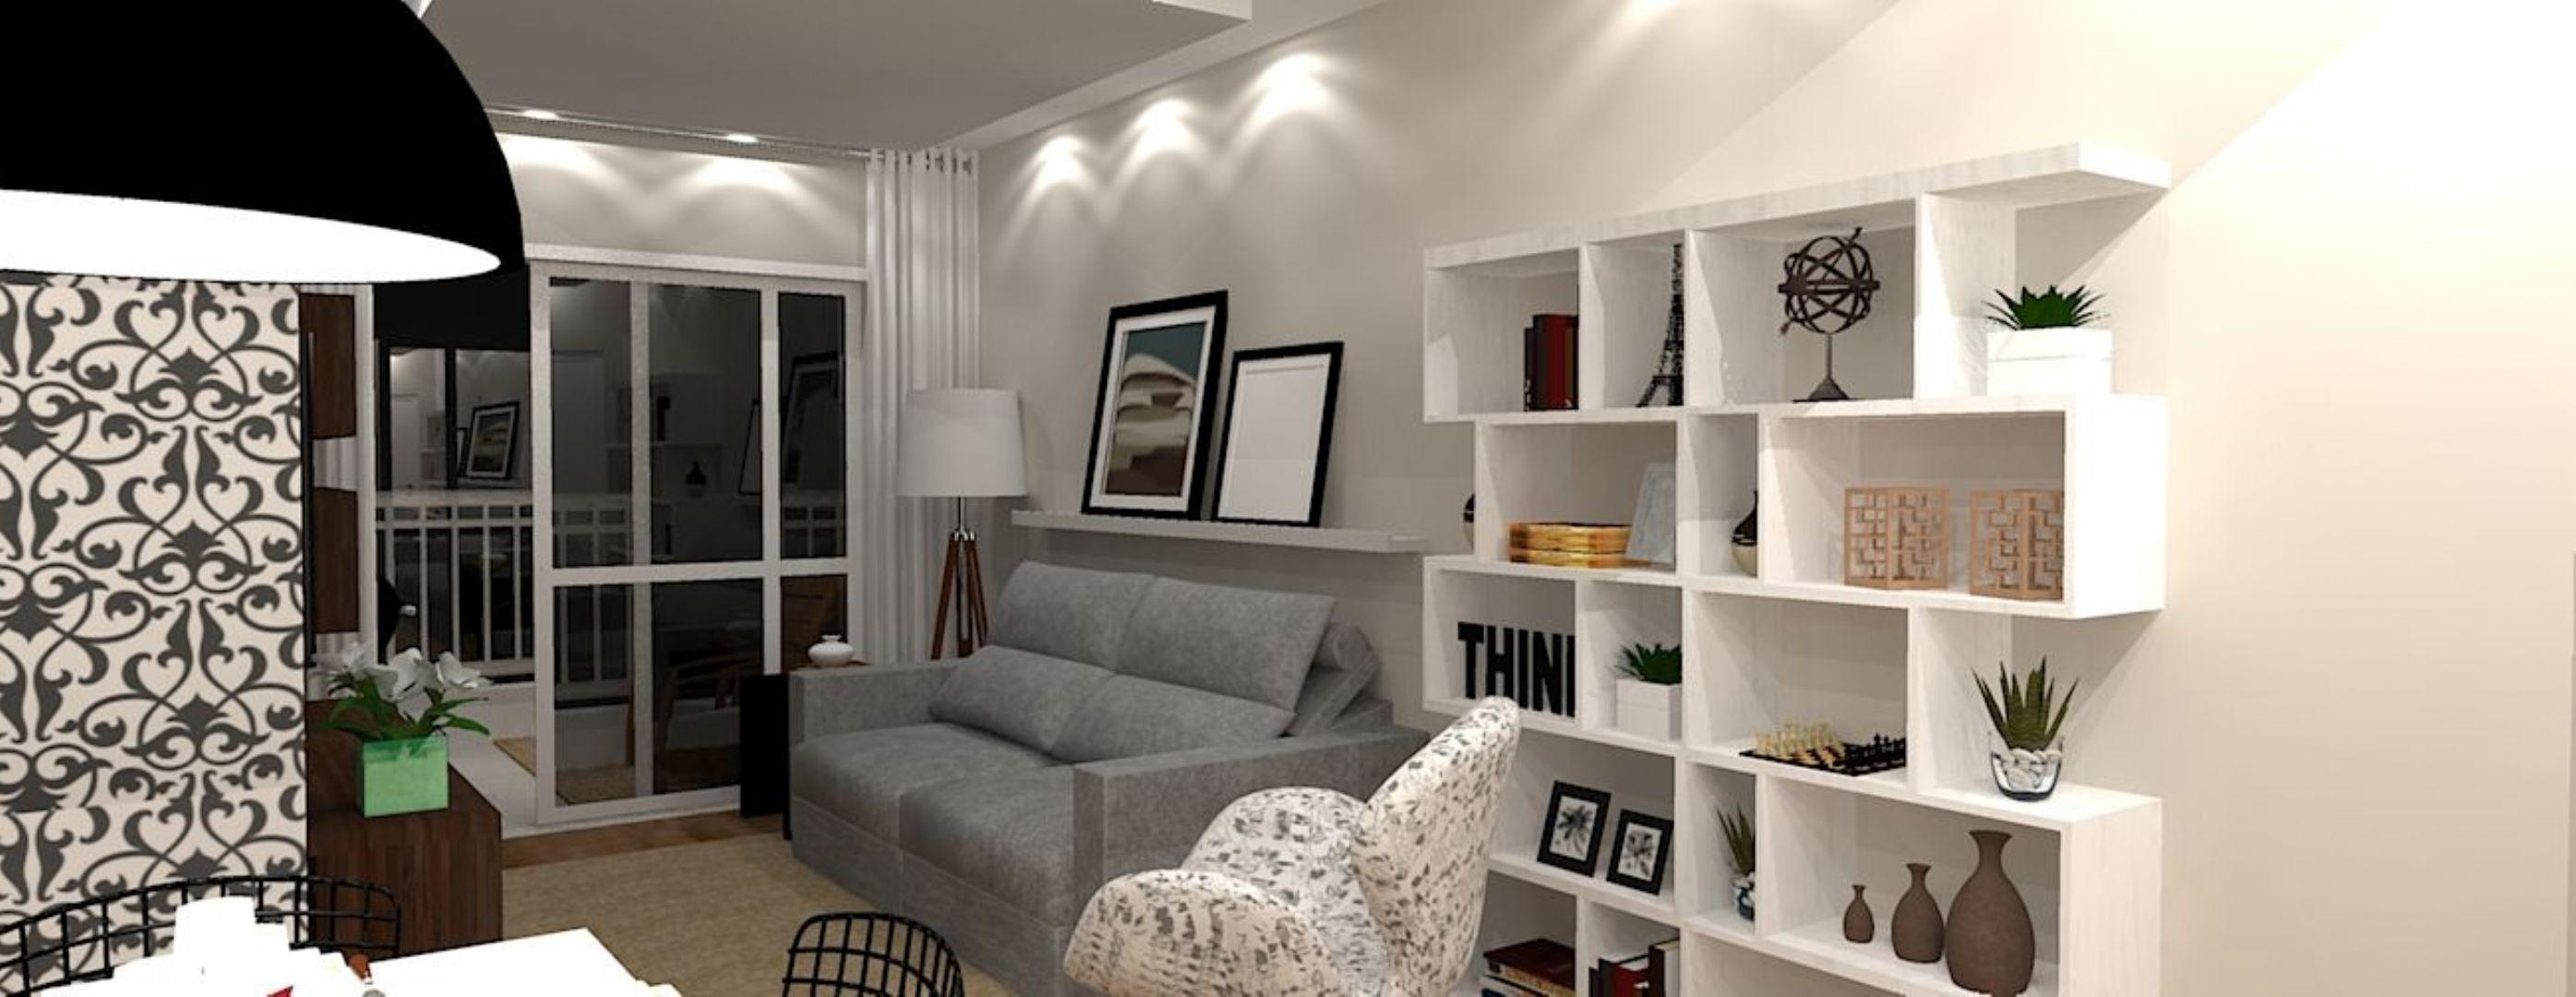 Projeto completo de apartamento